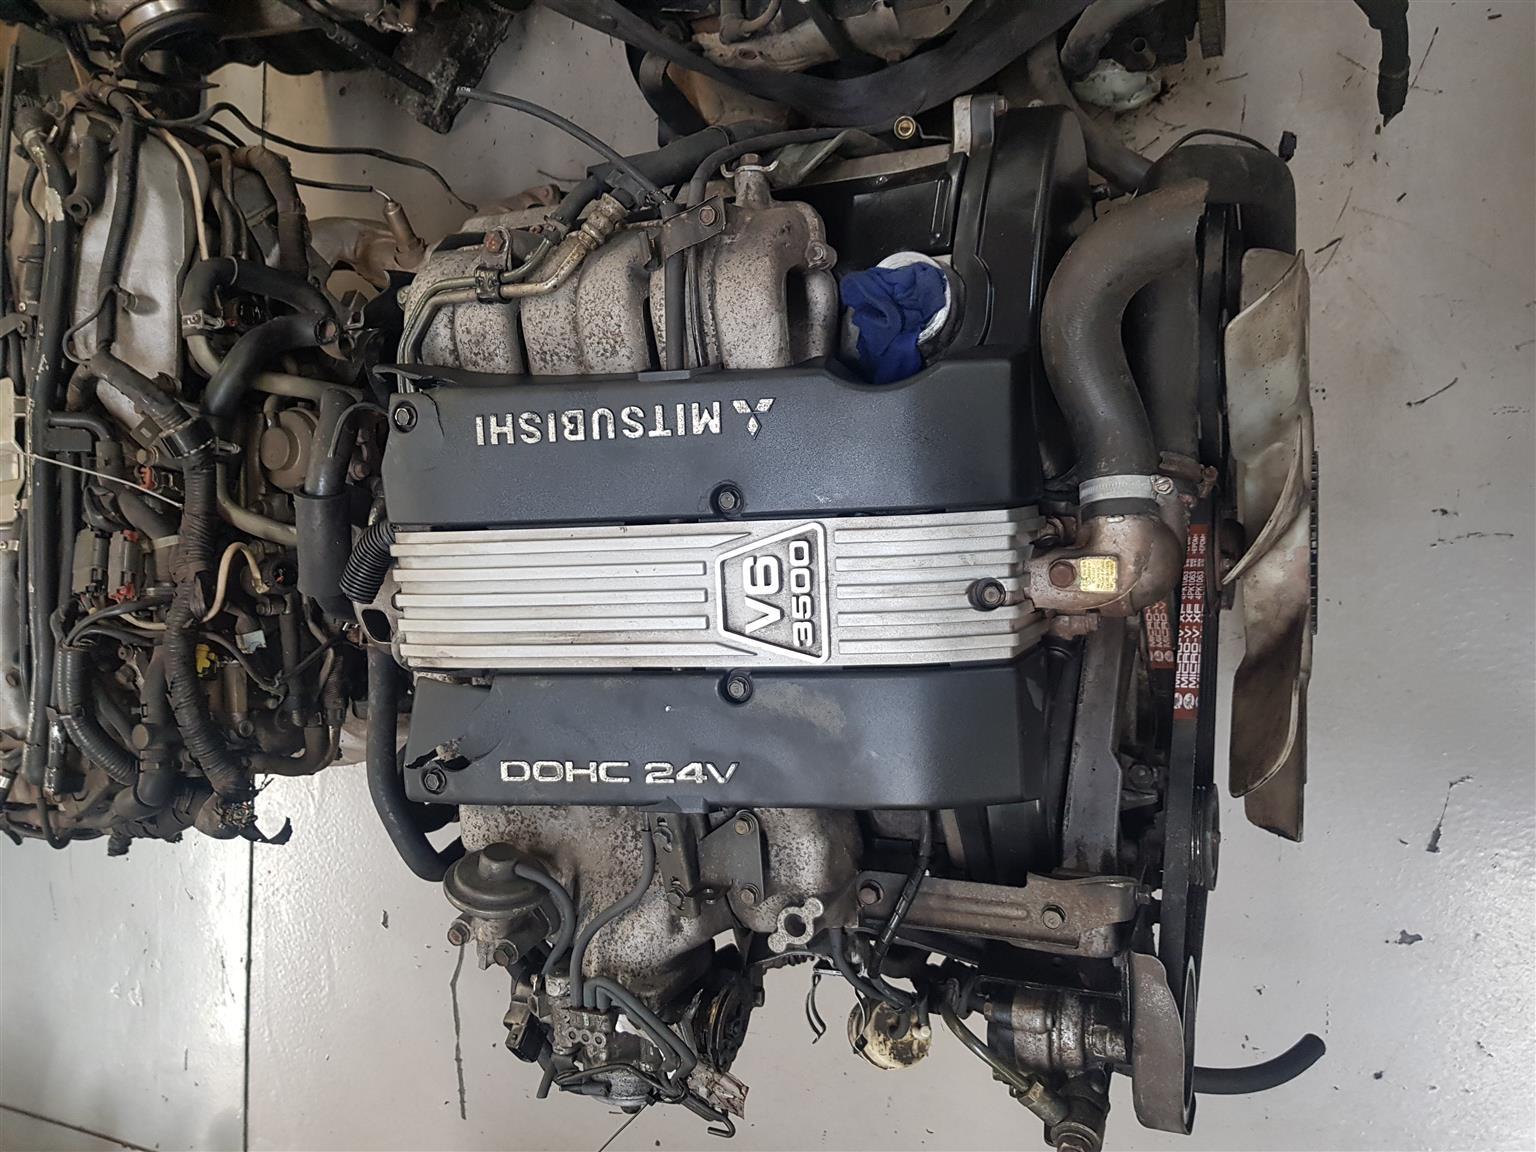 MITSUBISHI 3.5 V6 24 VALVE ENGINE (6G74) FOR SALE